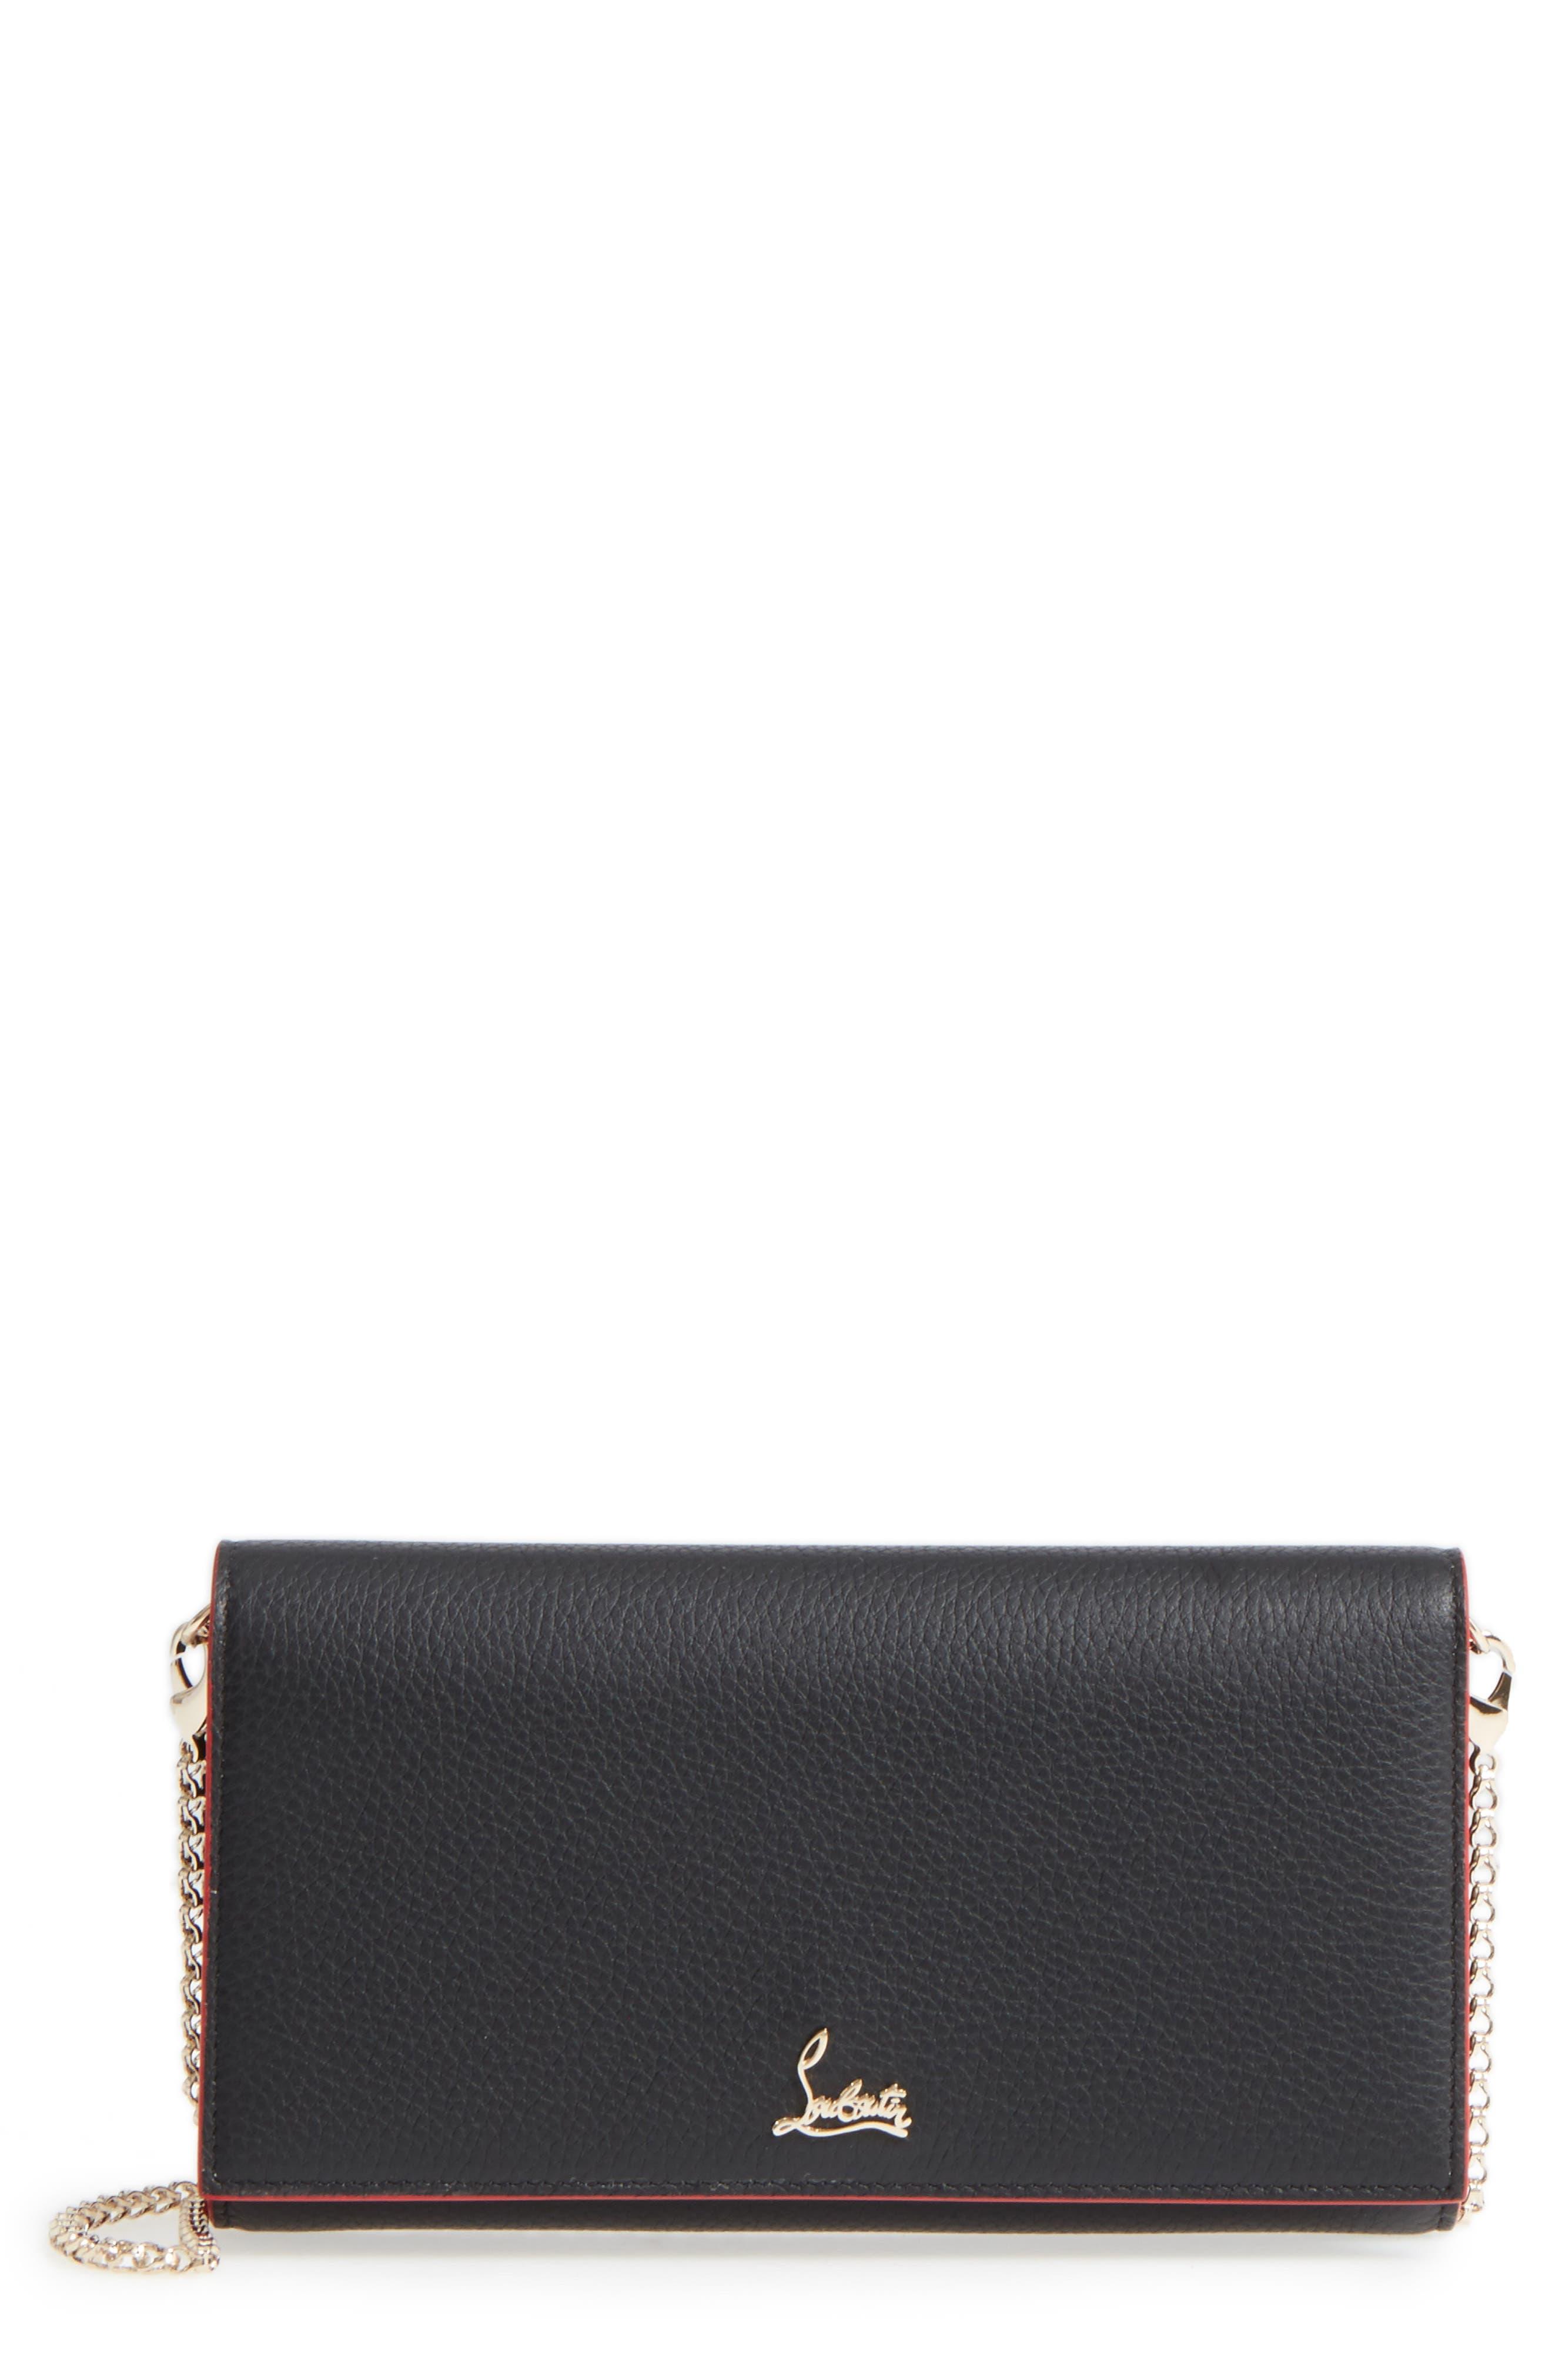 Boudoir Calfskin Leather Wallet,                             Main thumbnail 1, color,                             BLACK/ GOLD